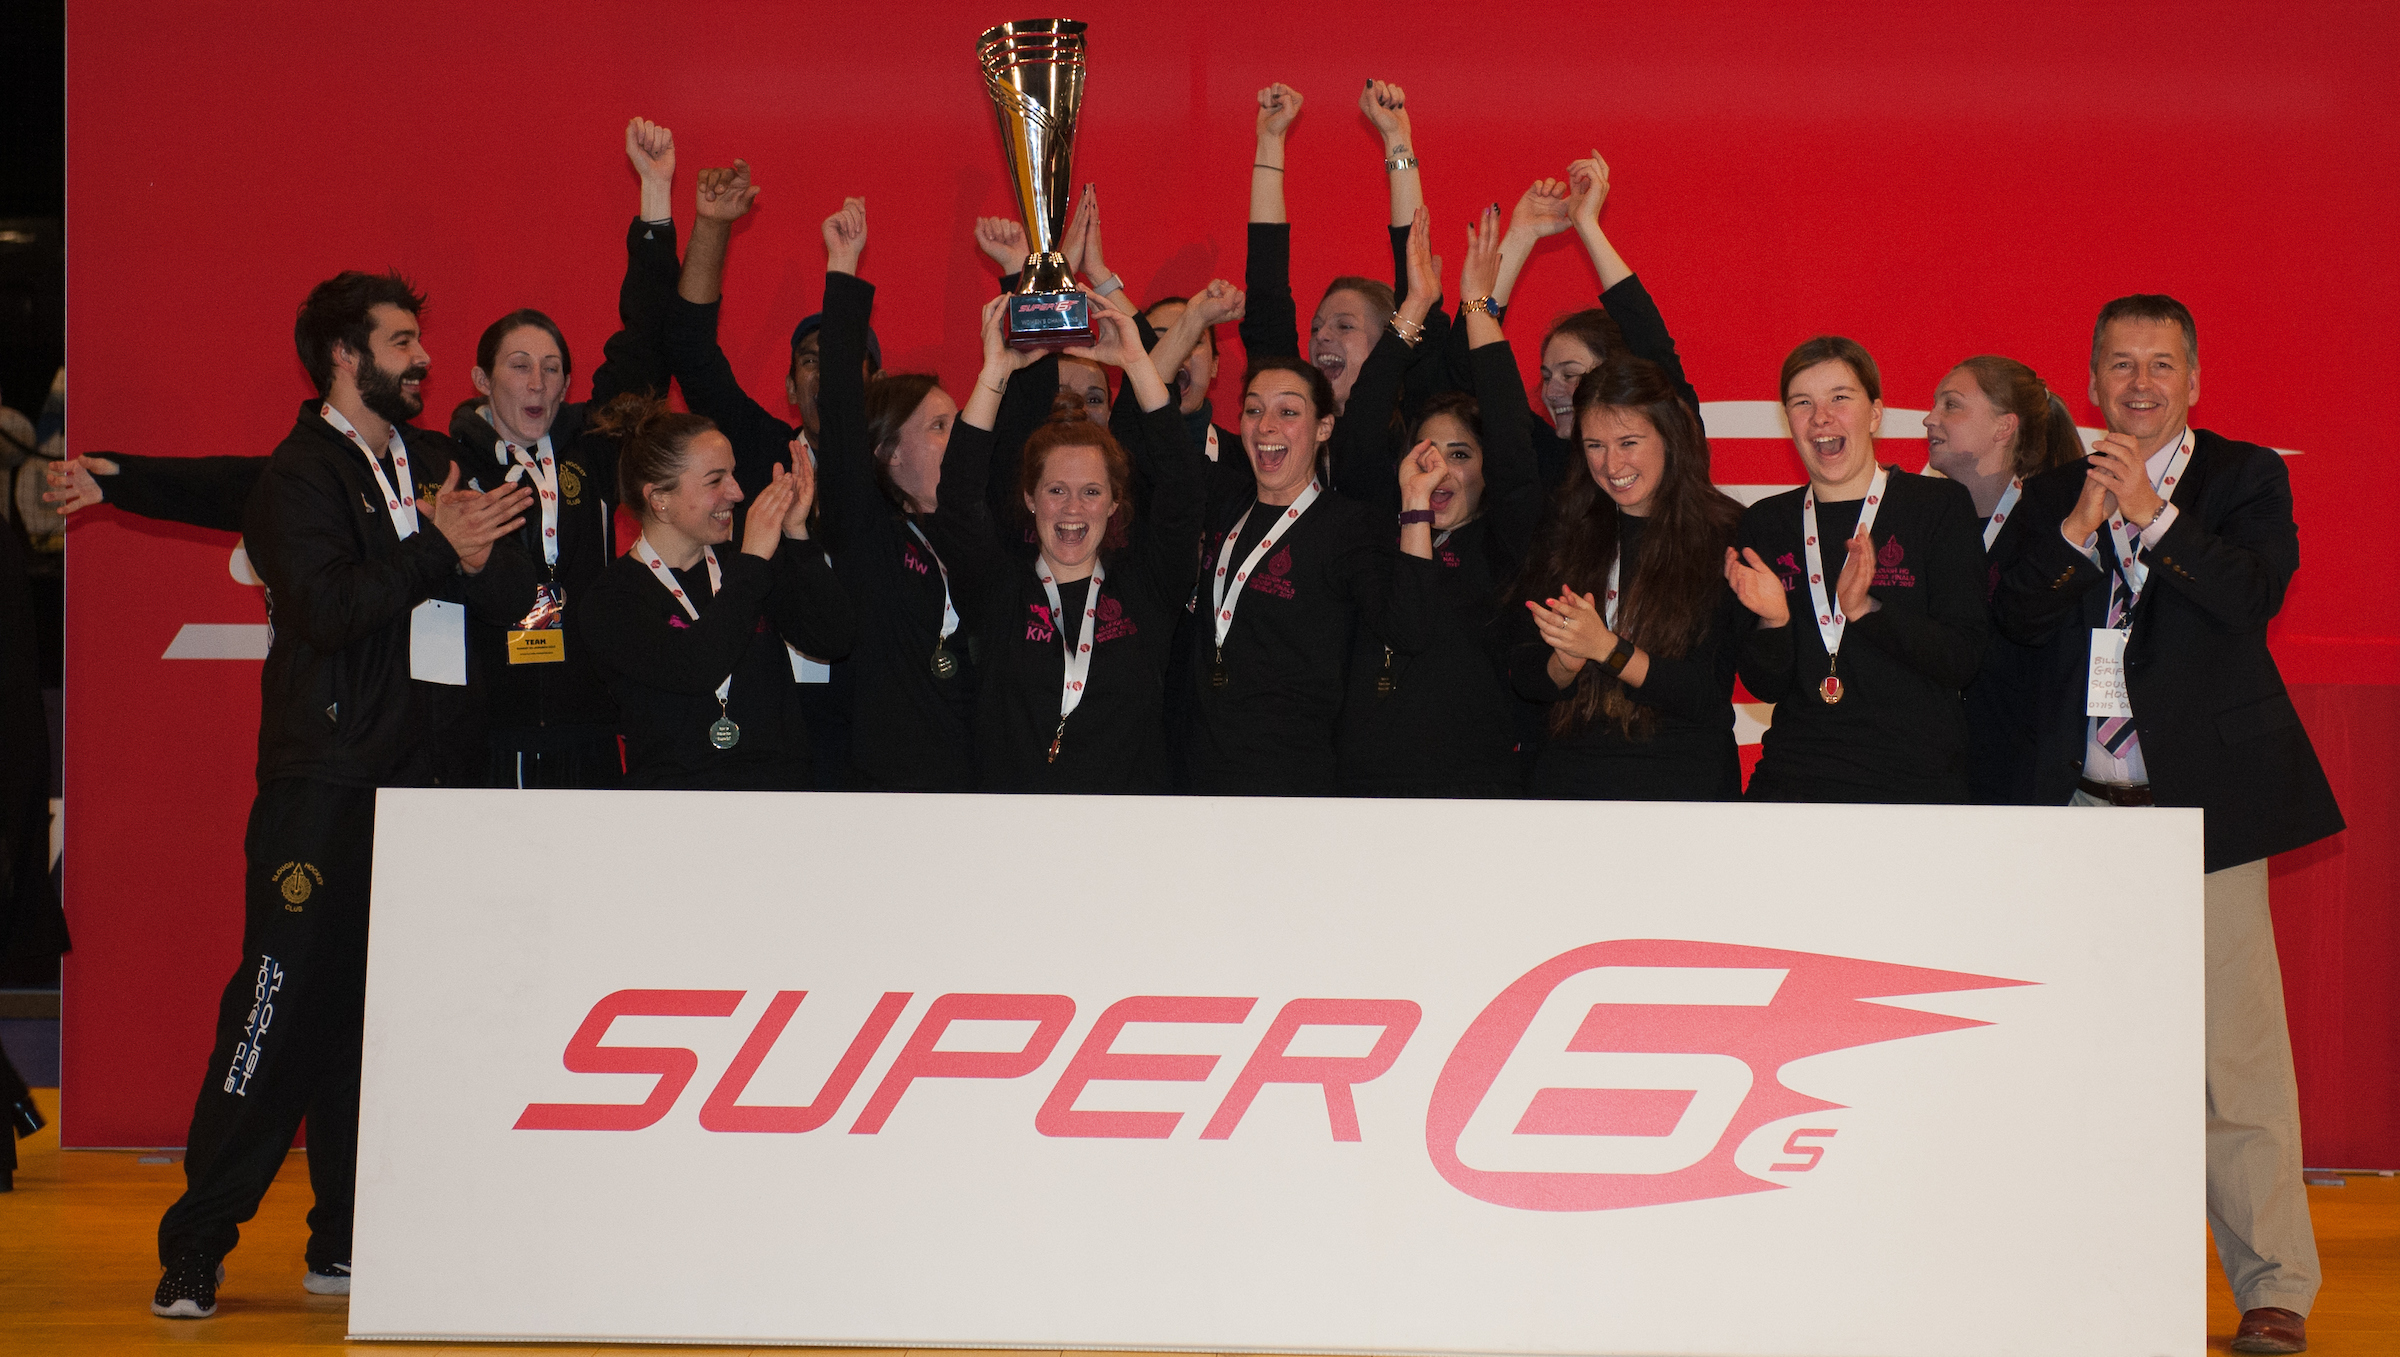 Slough lift the trophy - Final Super 6s, SSE Arena, Wembley, London, UK on 29 January 2017. Photo: Simon Parker